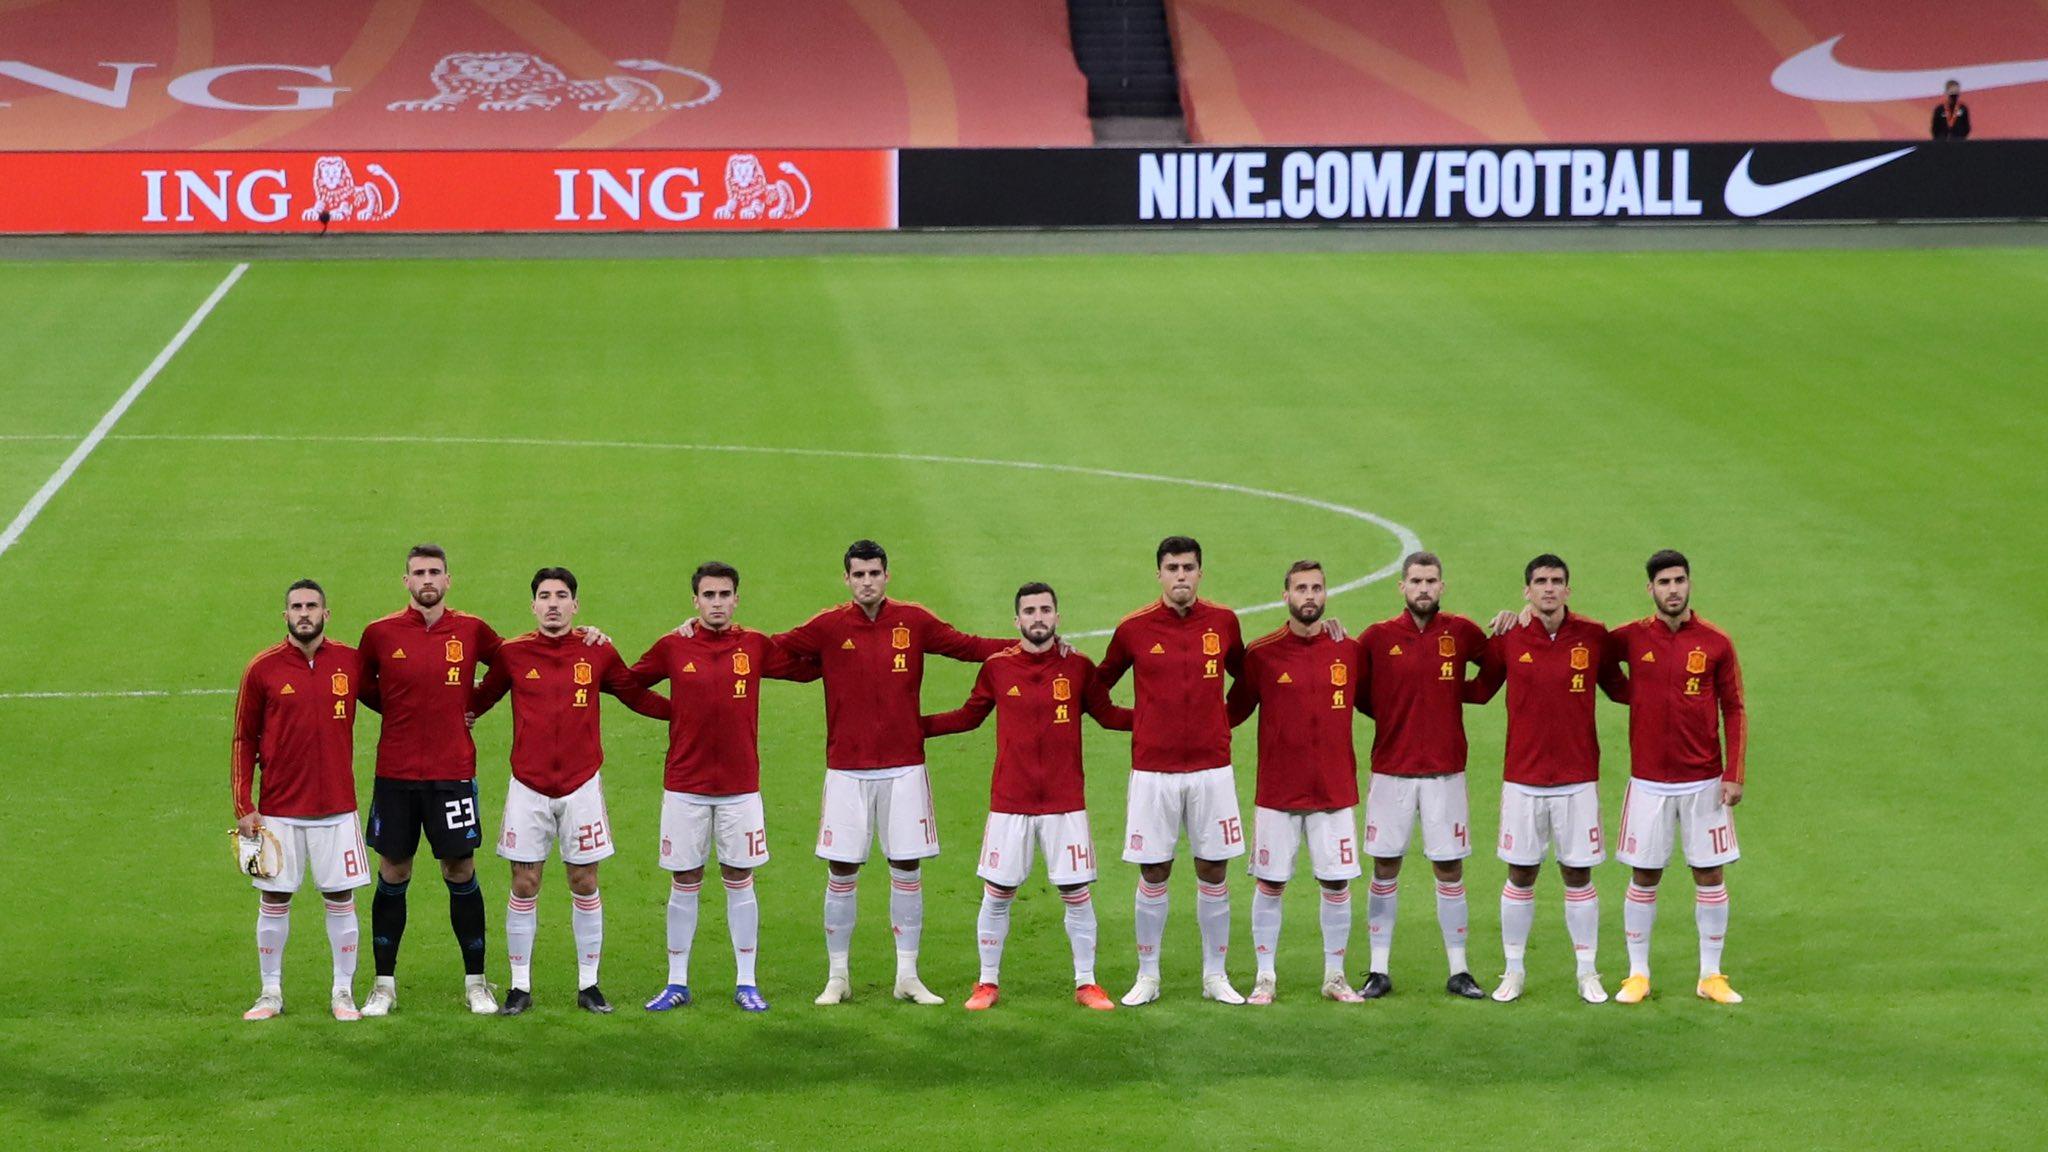 Hilo de la selección de España (selección española) - Página 2 EmnXG-bW4AAUJWo?format=jpg&name=large